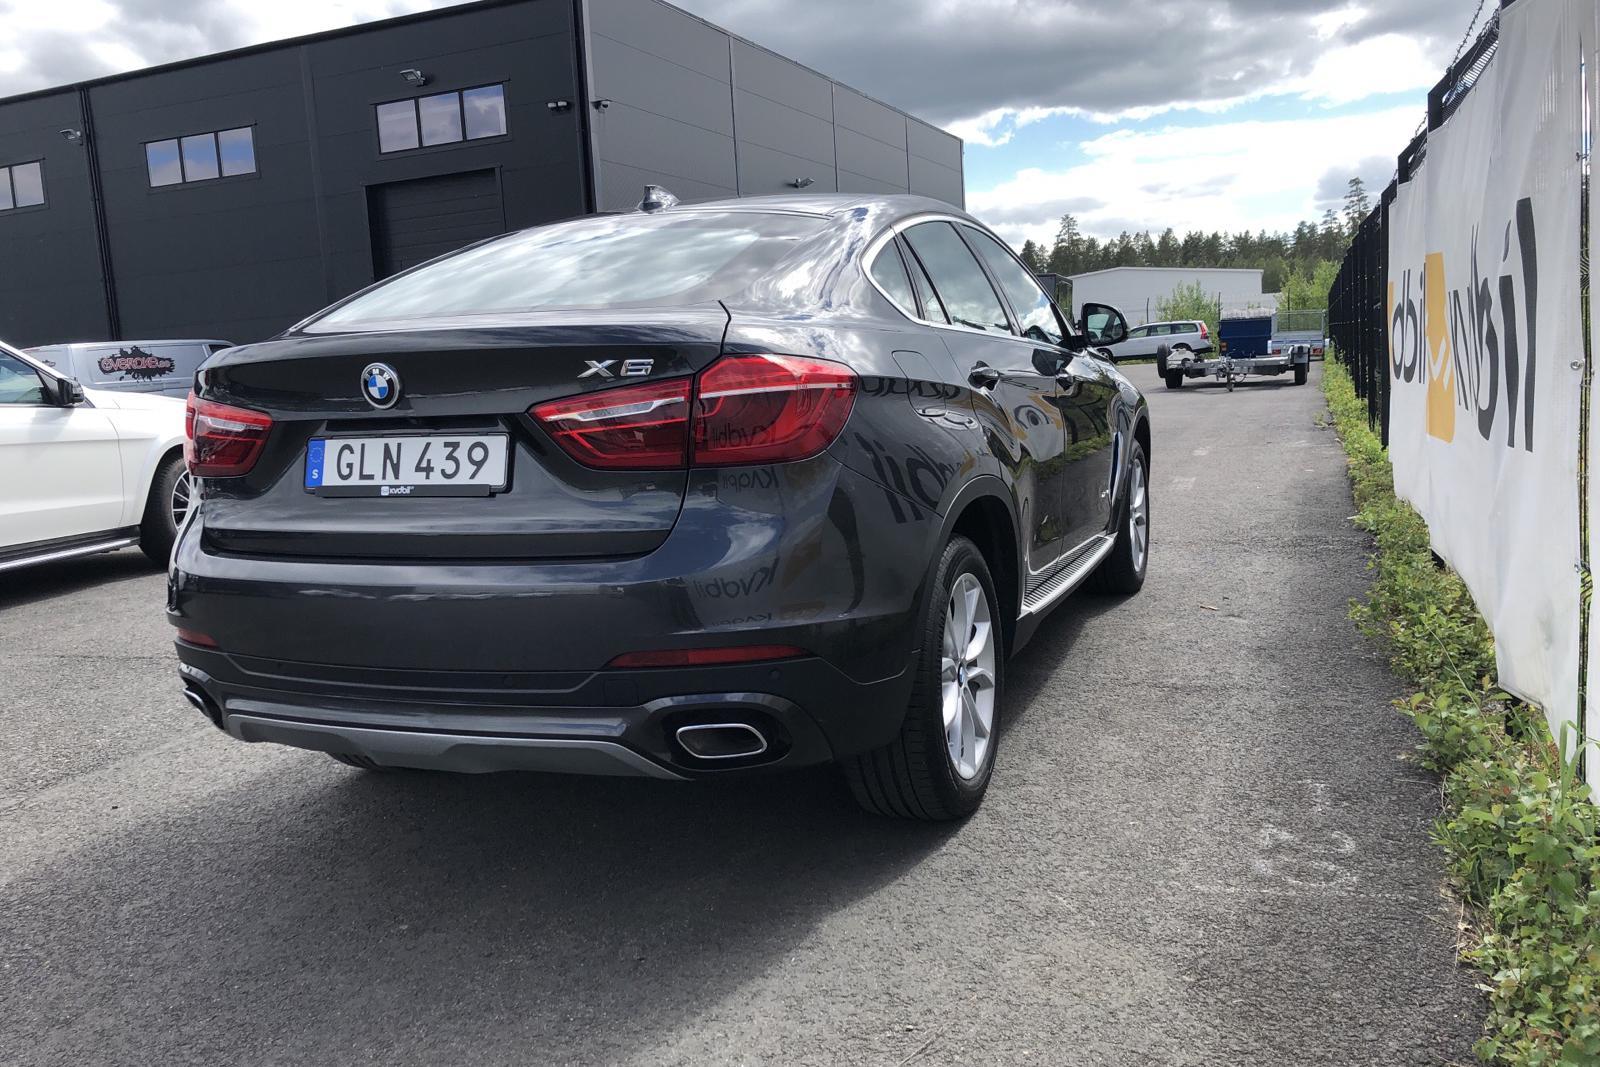 BMW X6 xDrive 40d, F16 (313hk) - 60 270 km - Automatic - gray - 2016